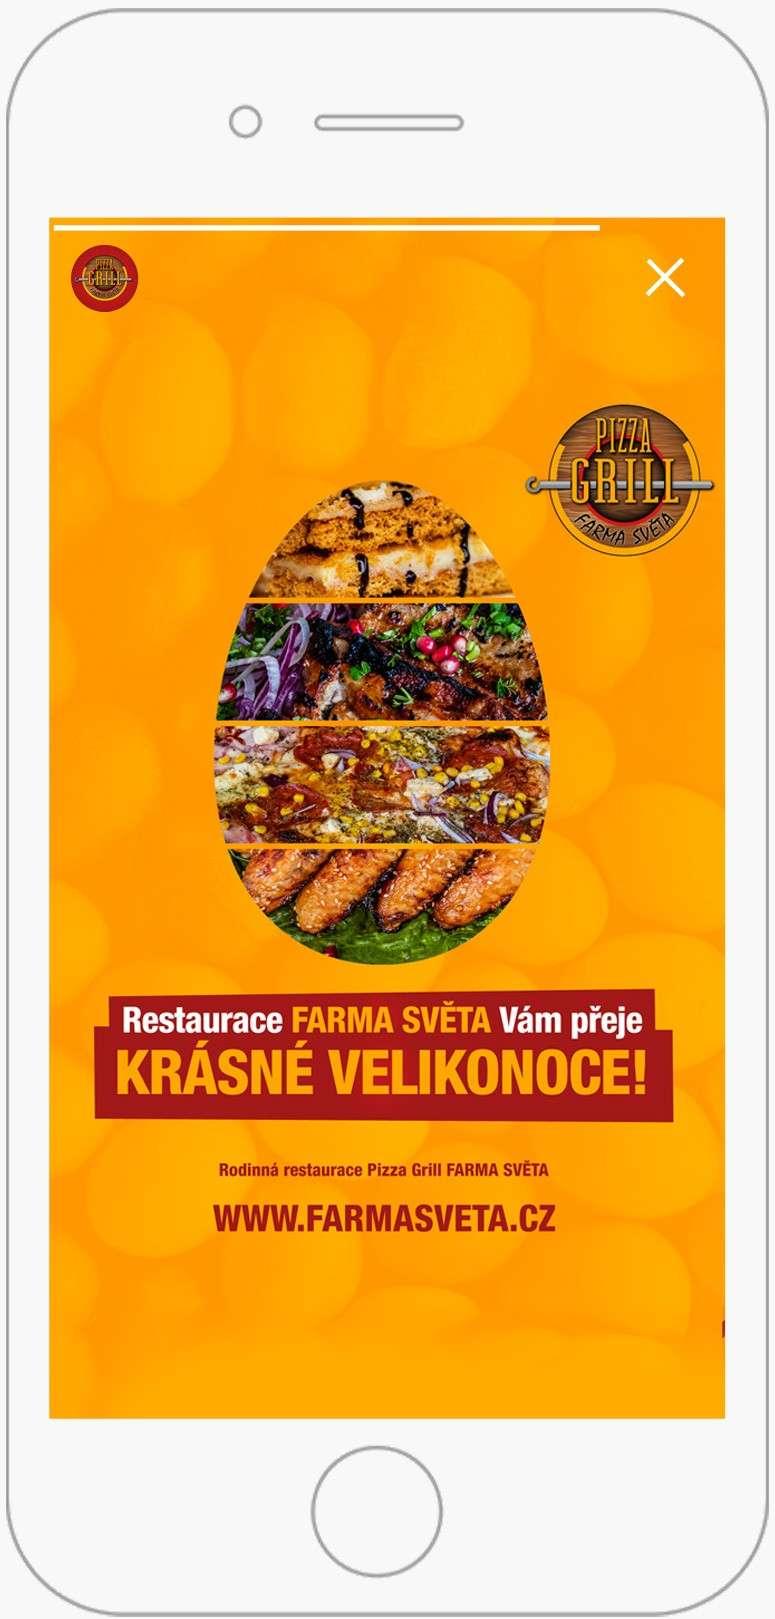 clubadvisor_reference_pizzagrillfarmasveta_on-line-marketing_instagram-single3